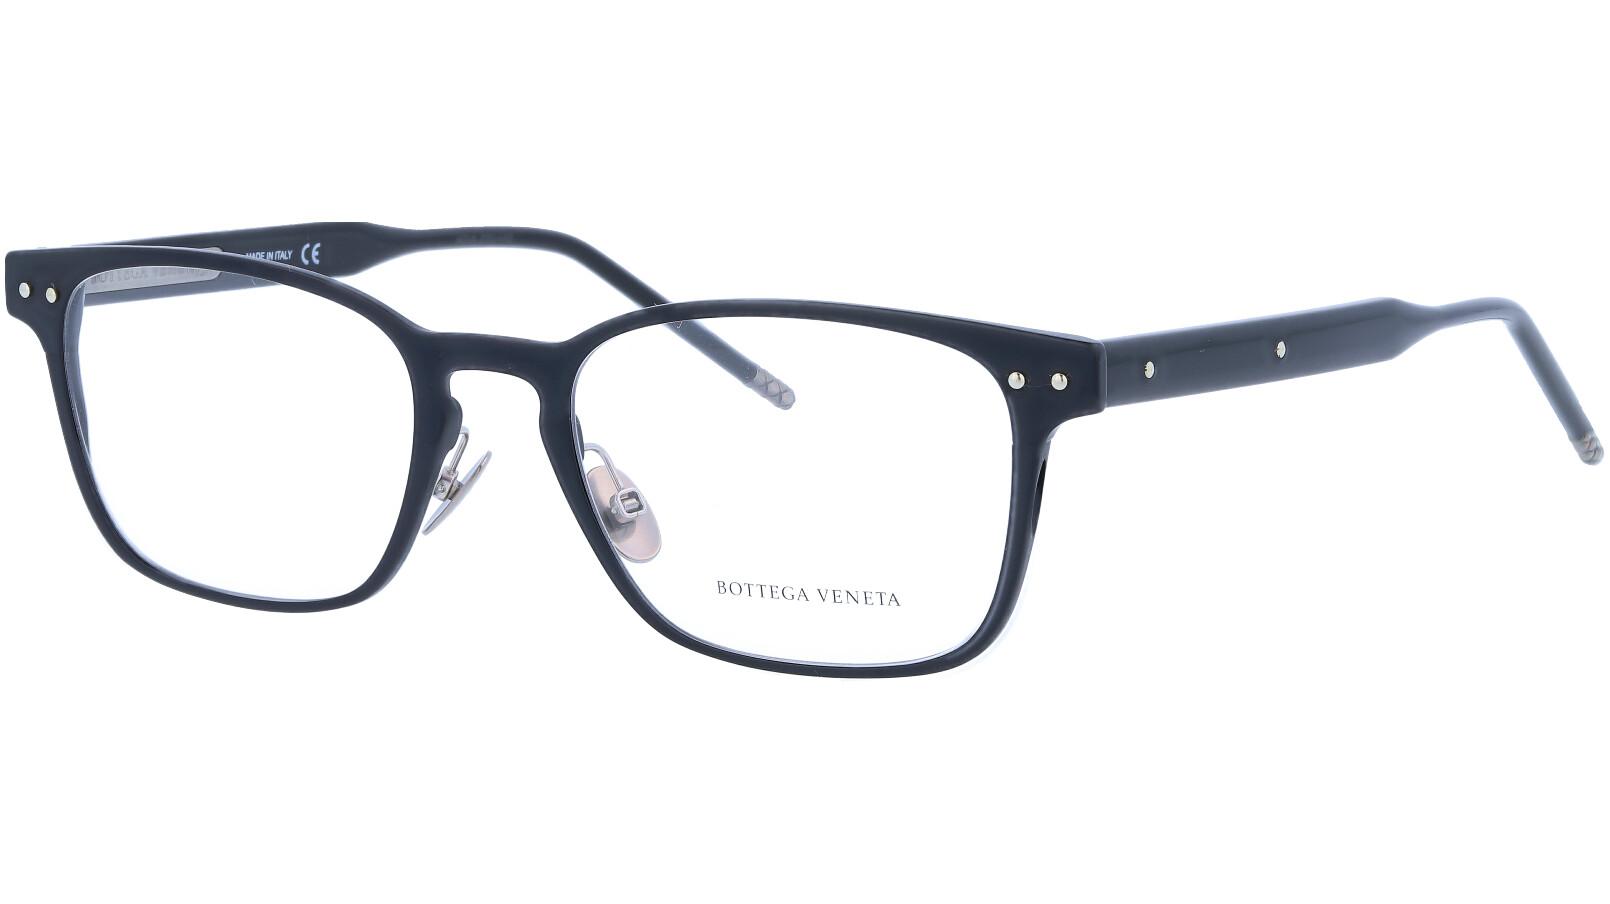 Bottega Veneta BV0213O 001 53 Black Glasses